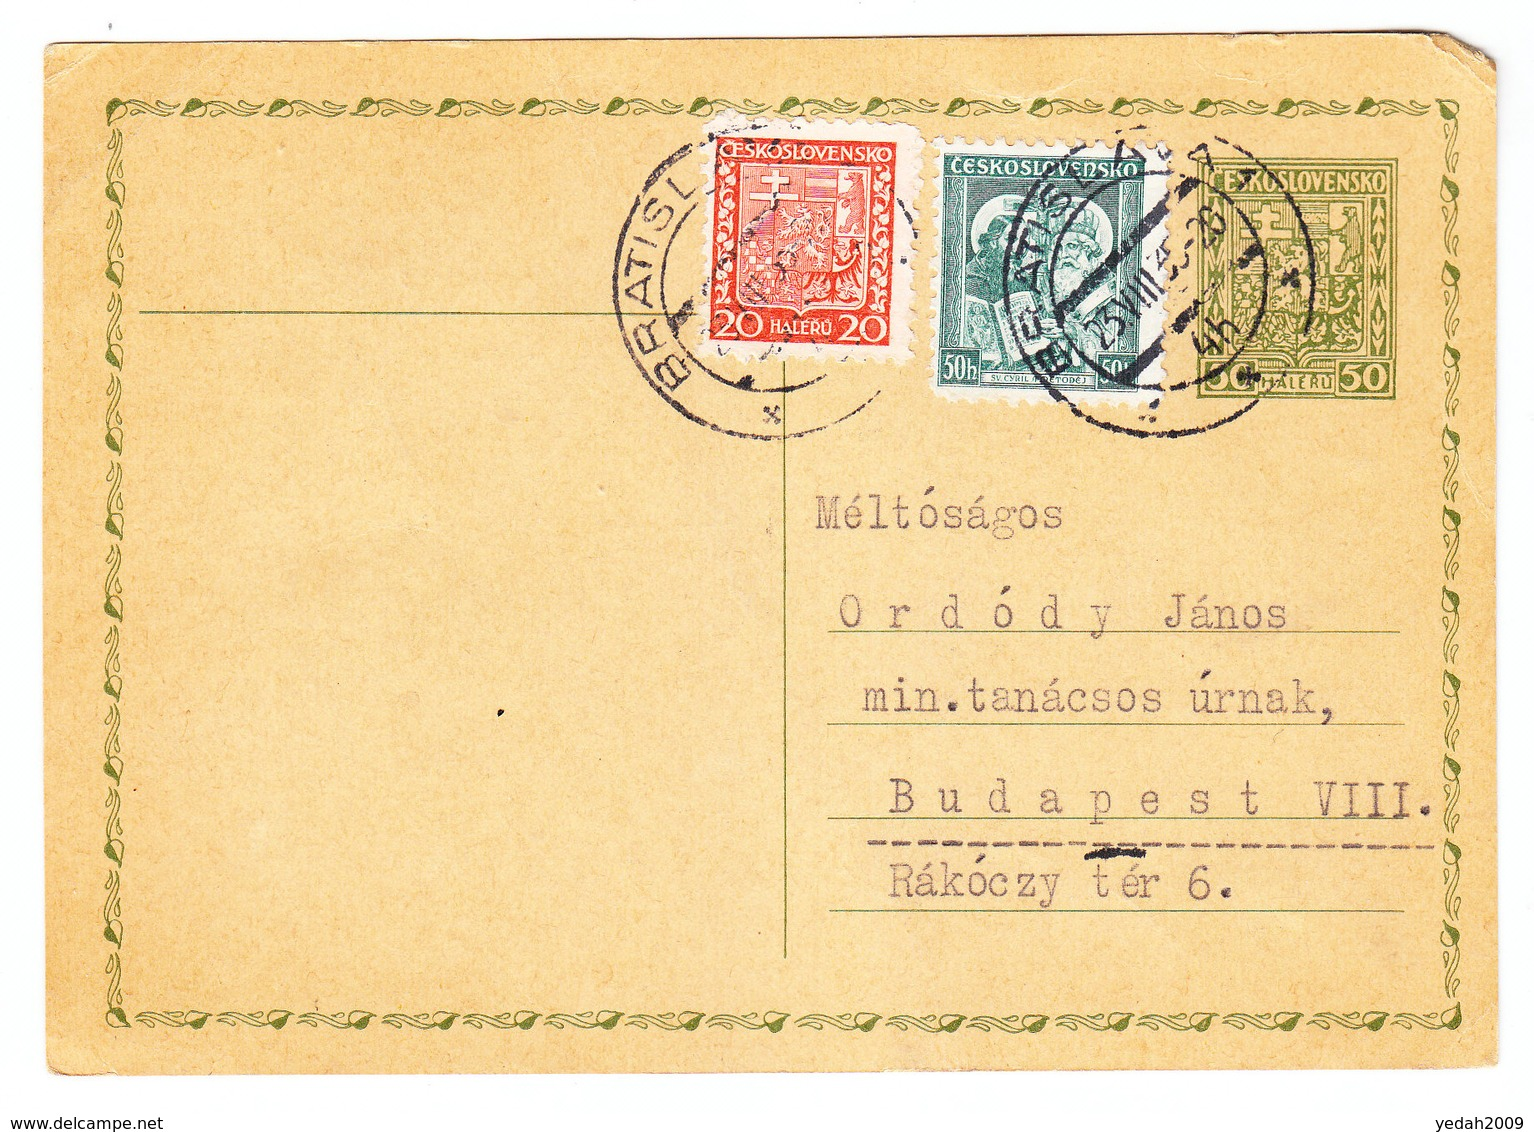 Czechoslovakia BRATISLAVA UPRATED POSTAL CARD TO Hungary 1935 - Tschechoslowakei/CSSR